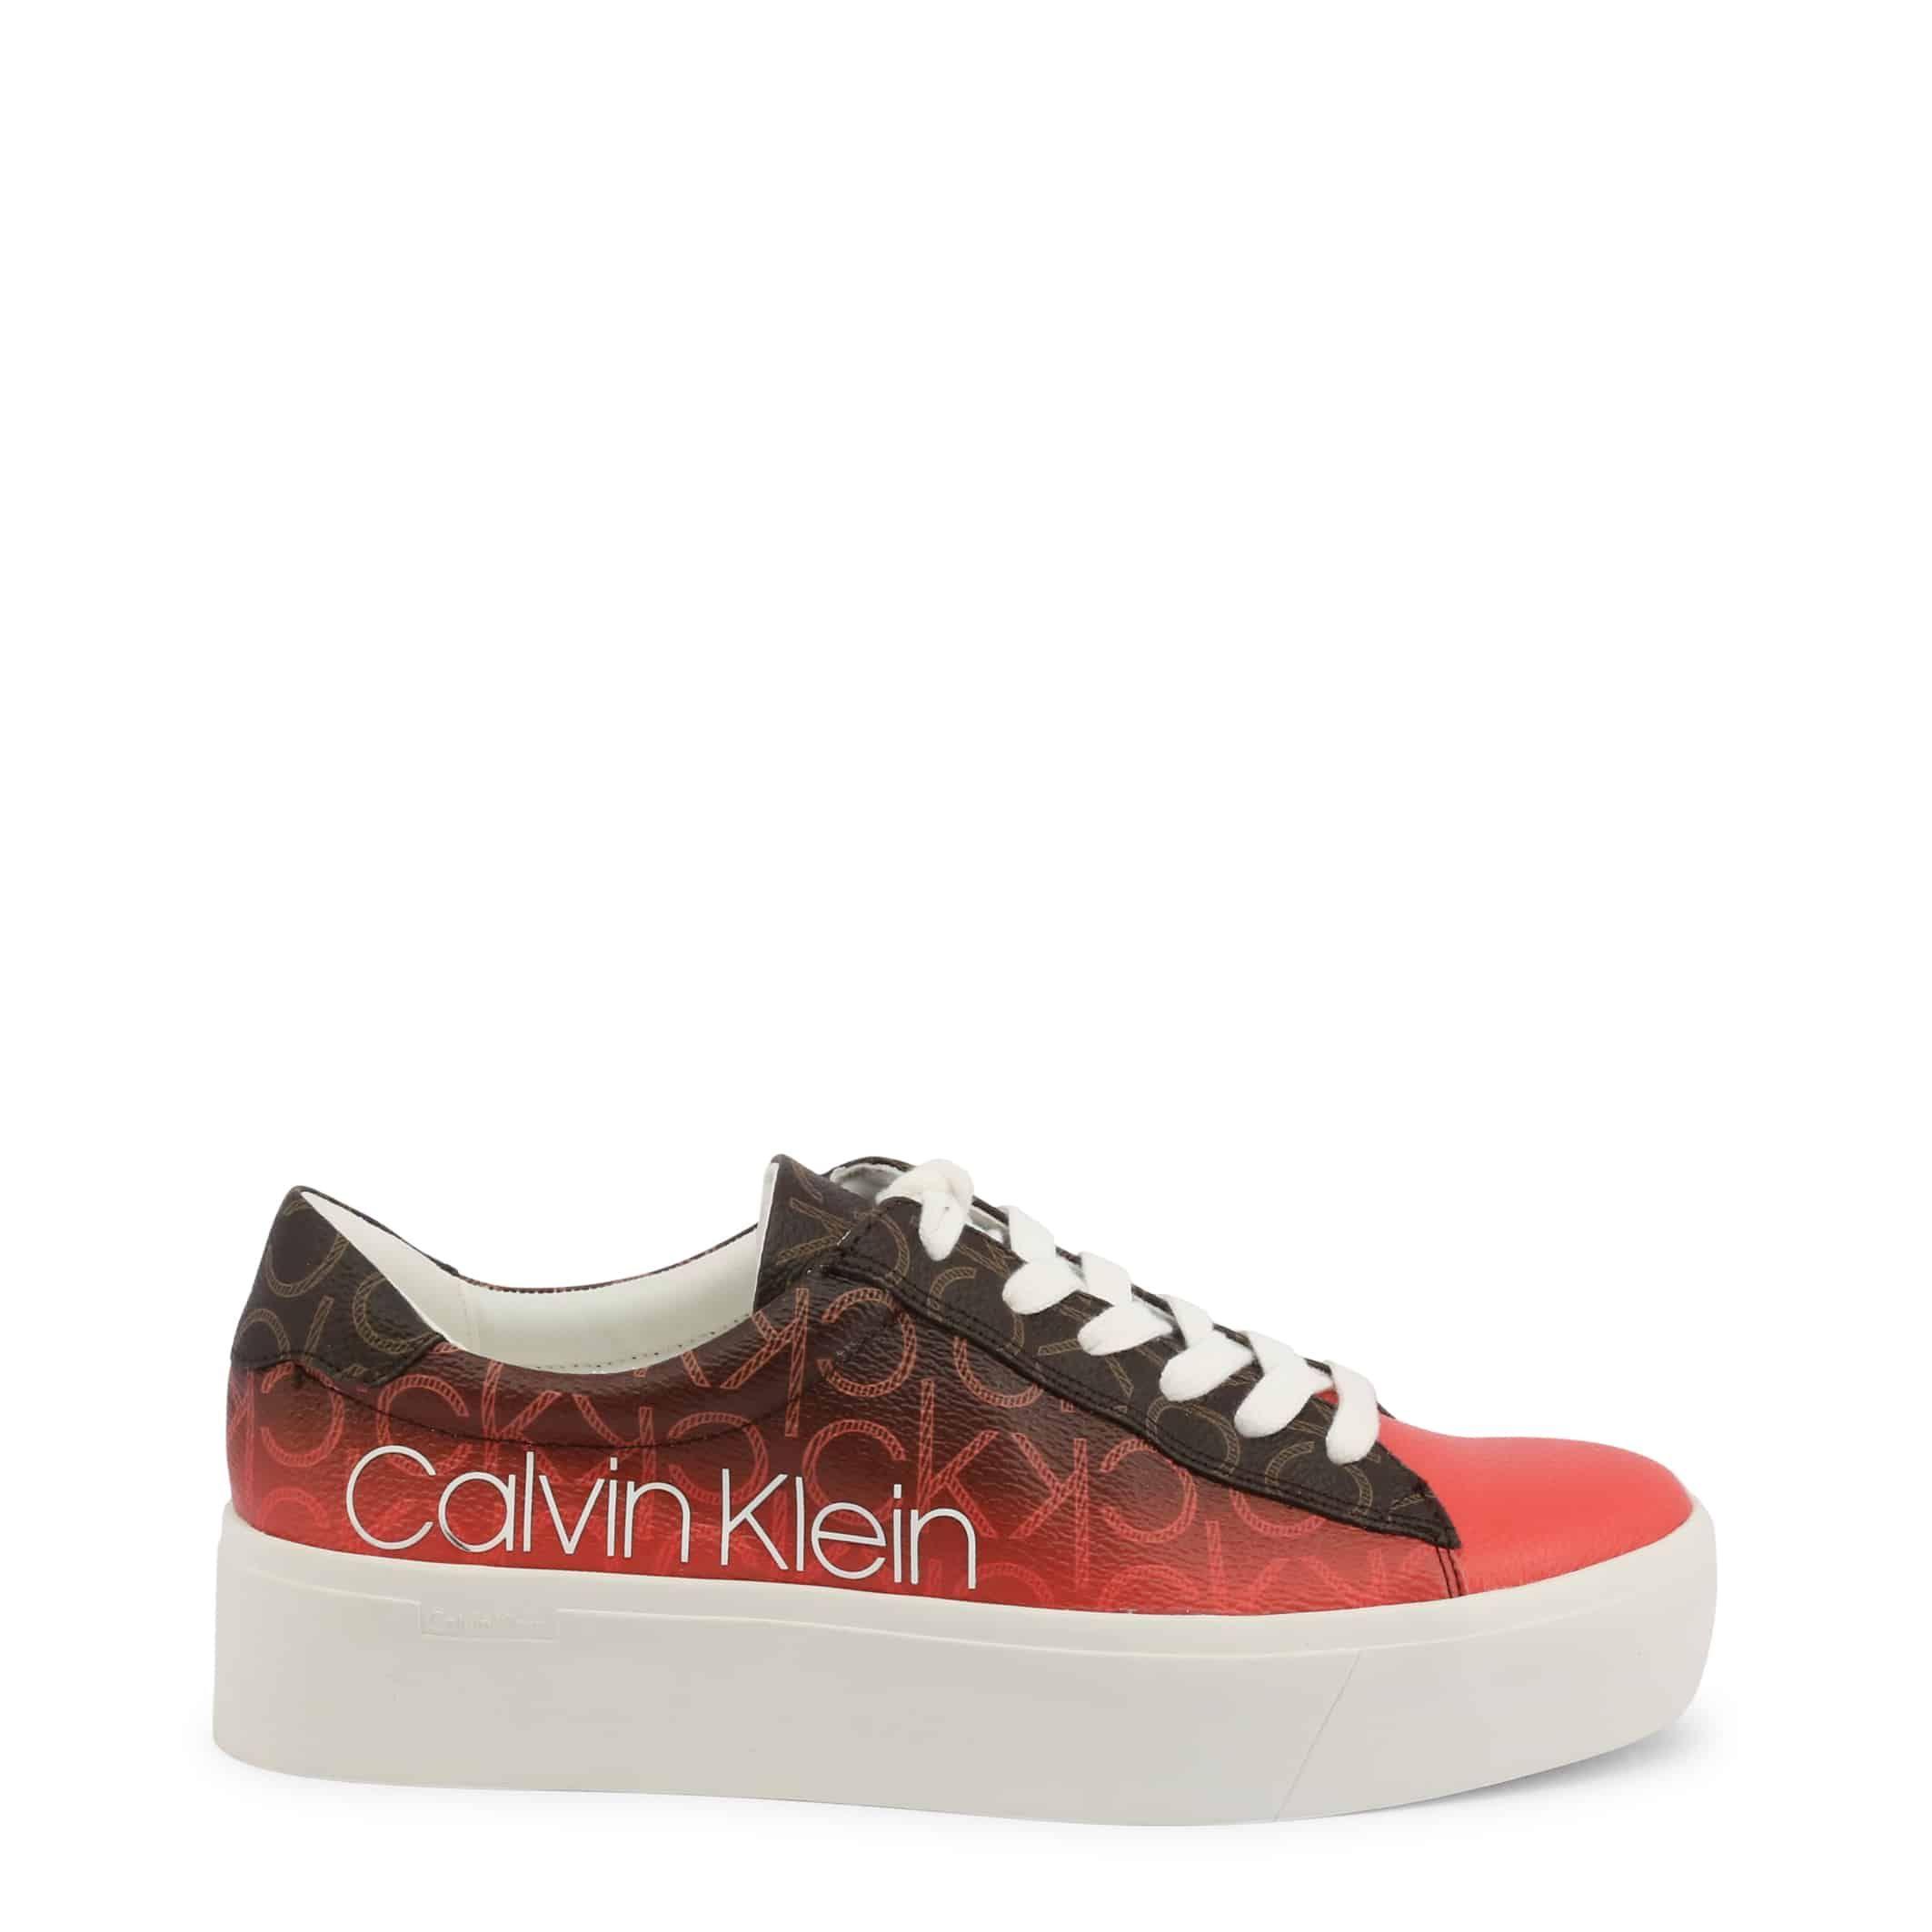 Calvin Klein – JANIKA_B4E7962 – Marrón